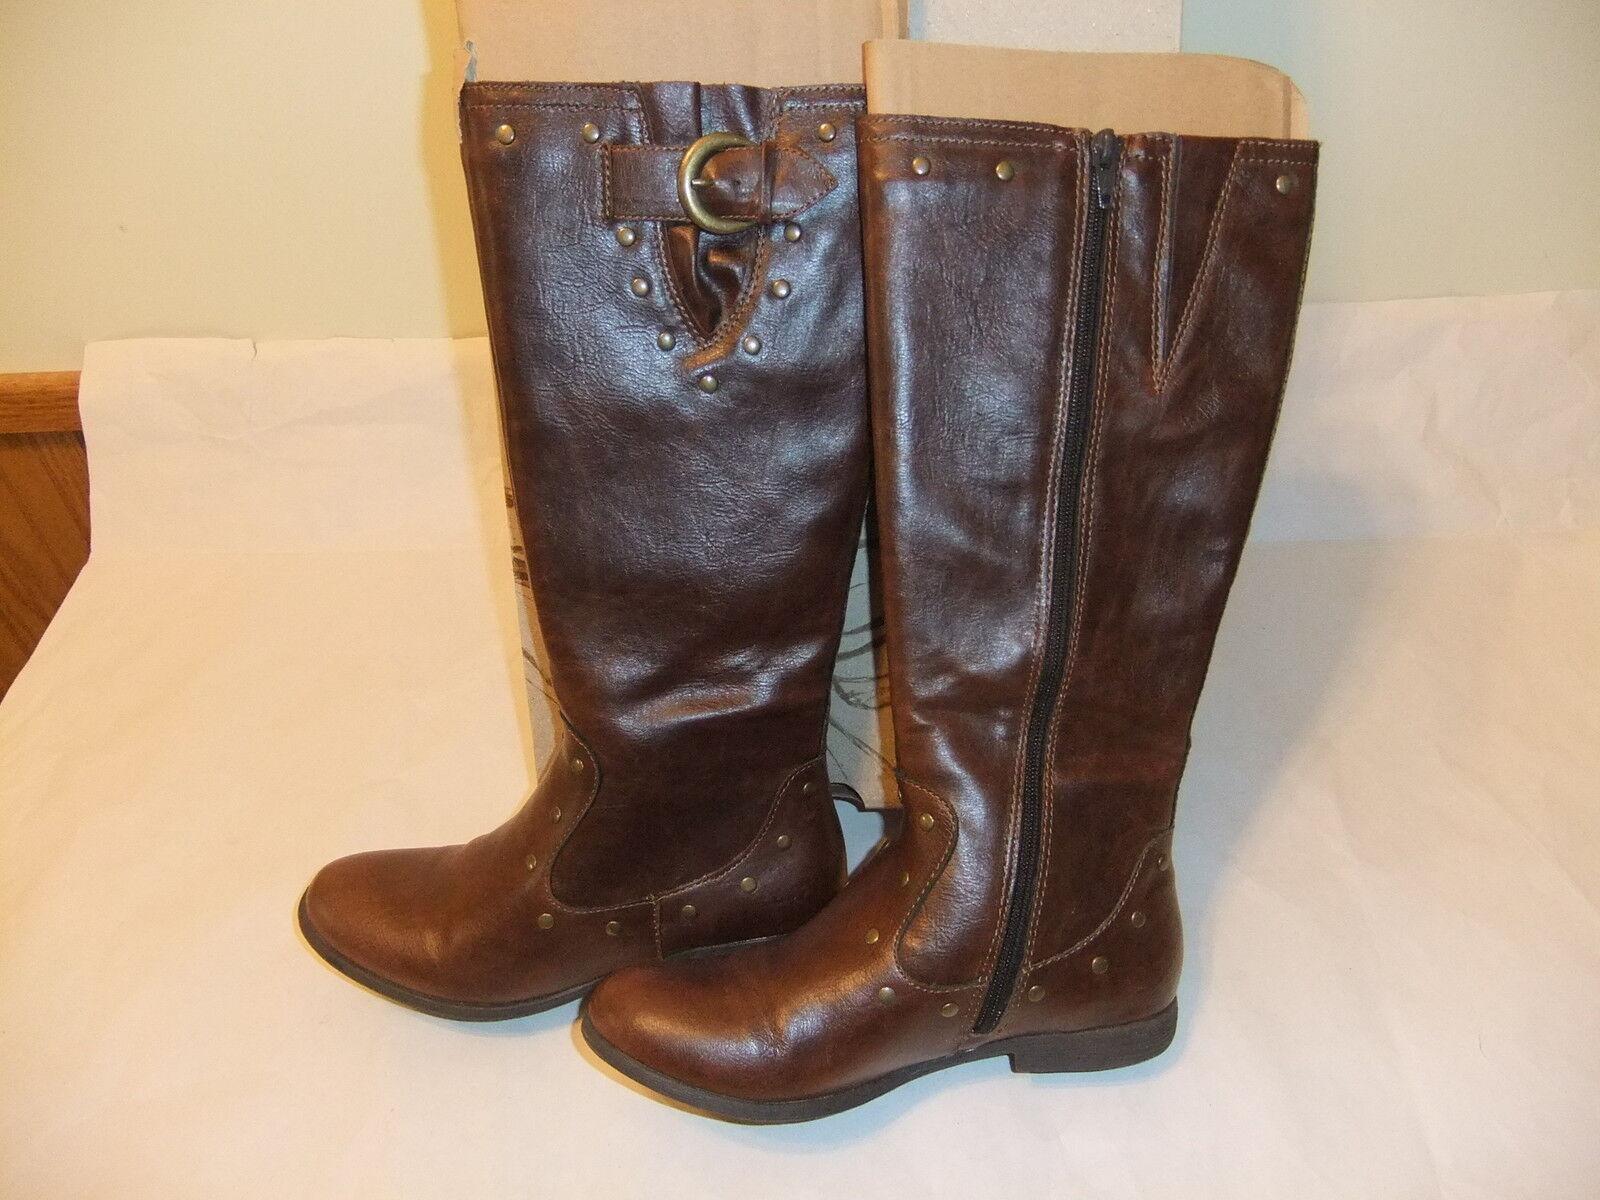 BORN Emilena Brown Fashion Knee High Boot Size 6.5 NIB